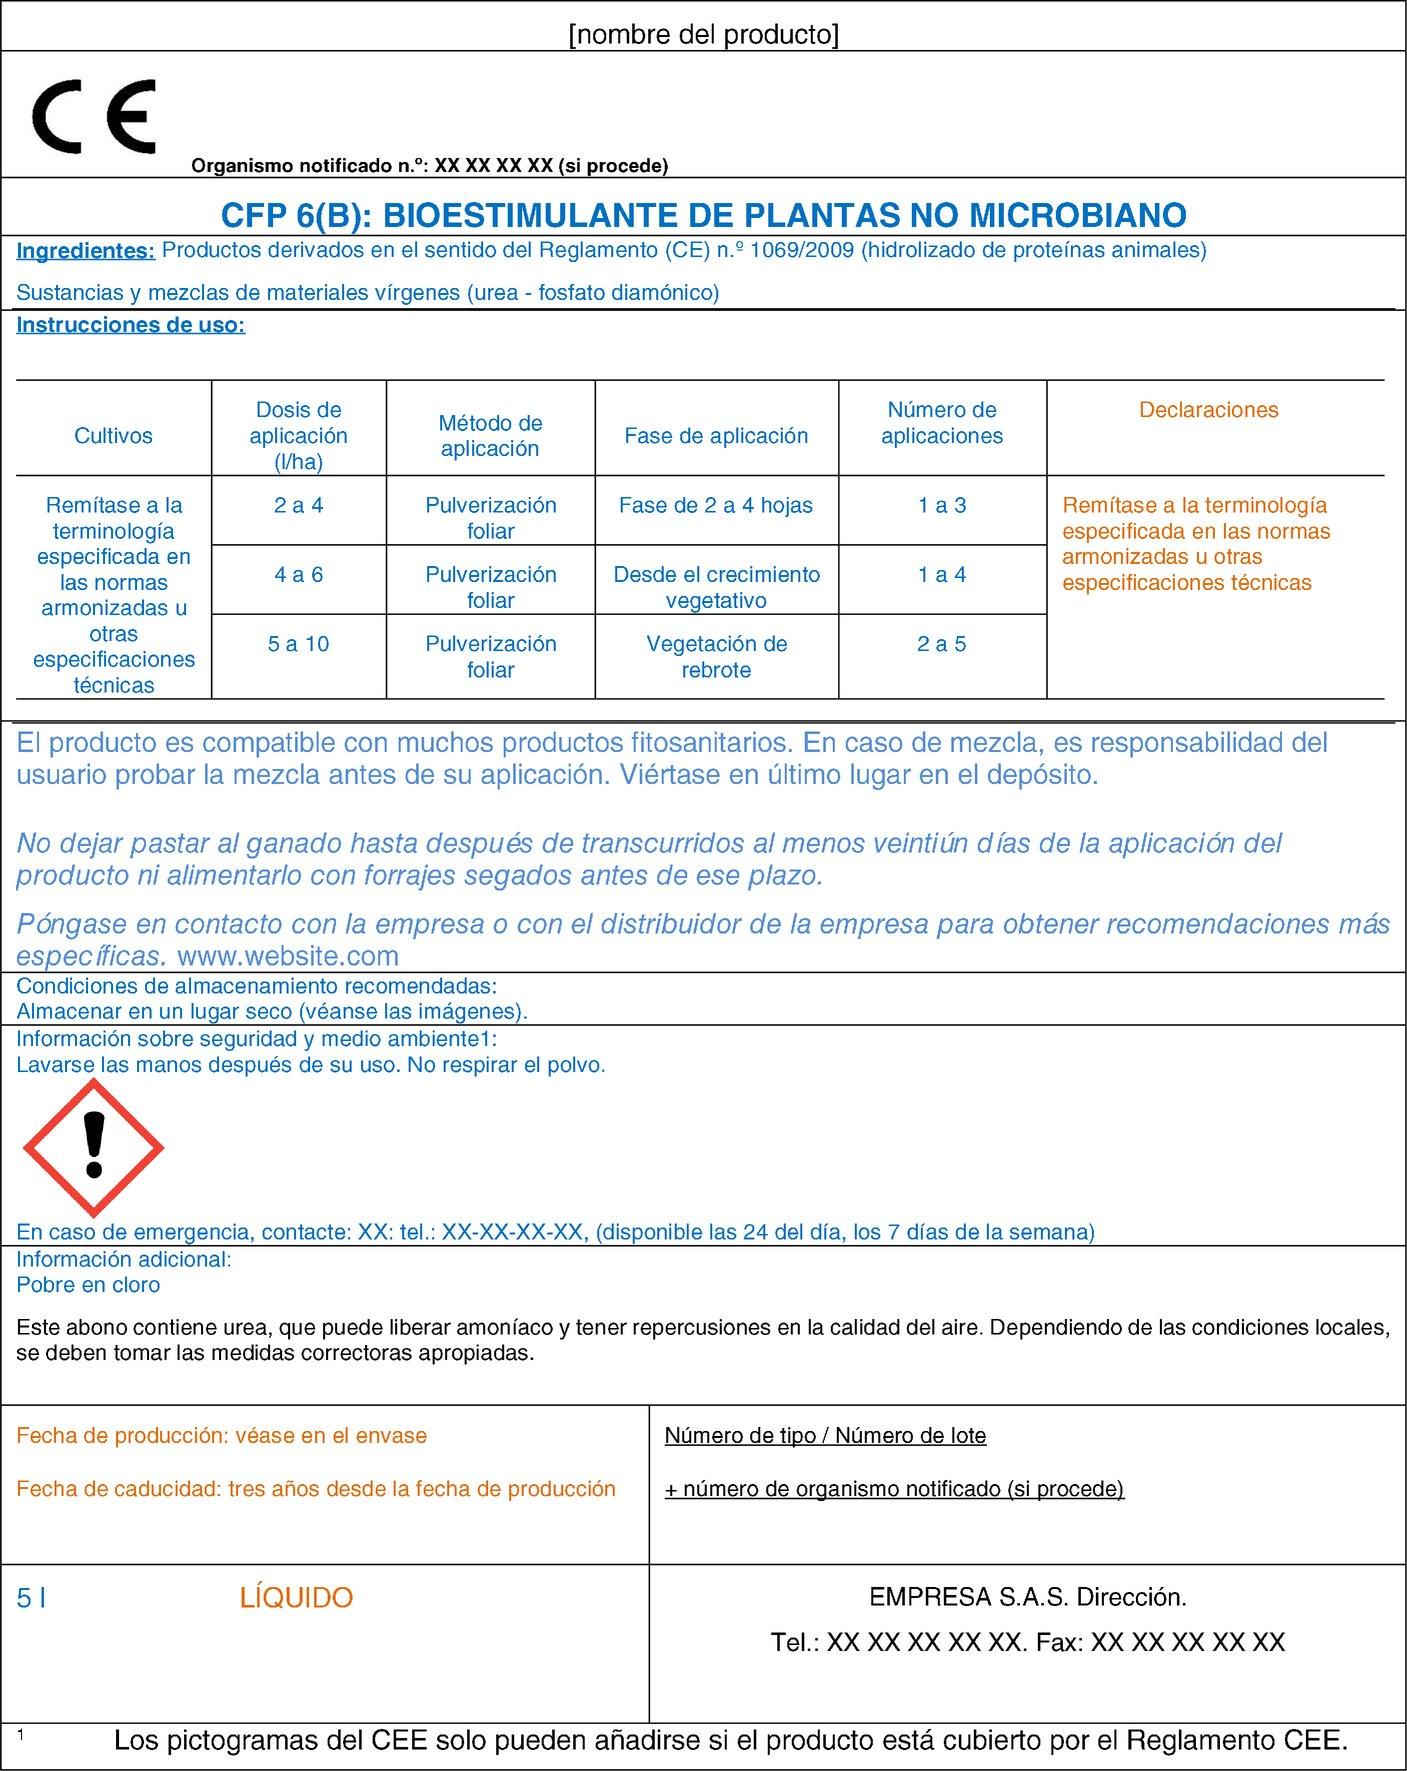 Imagen: http://publications.europa.eu/resource/uriserv/OJ.C_.2021.119.01.0001.01.SPA.xhtml.C_2021119ES.01003601.tif.jpg